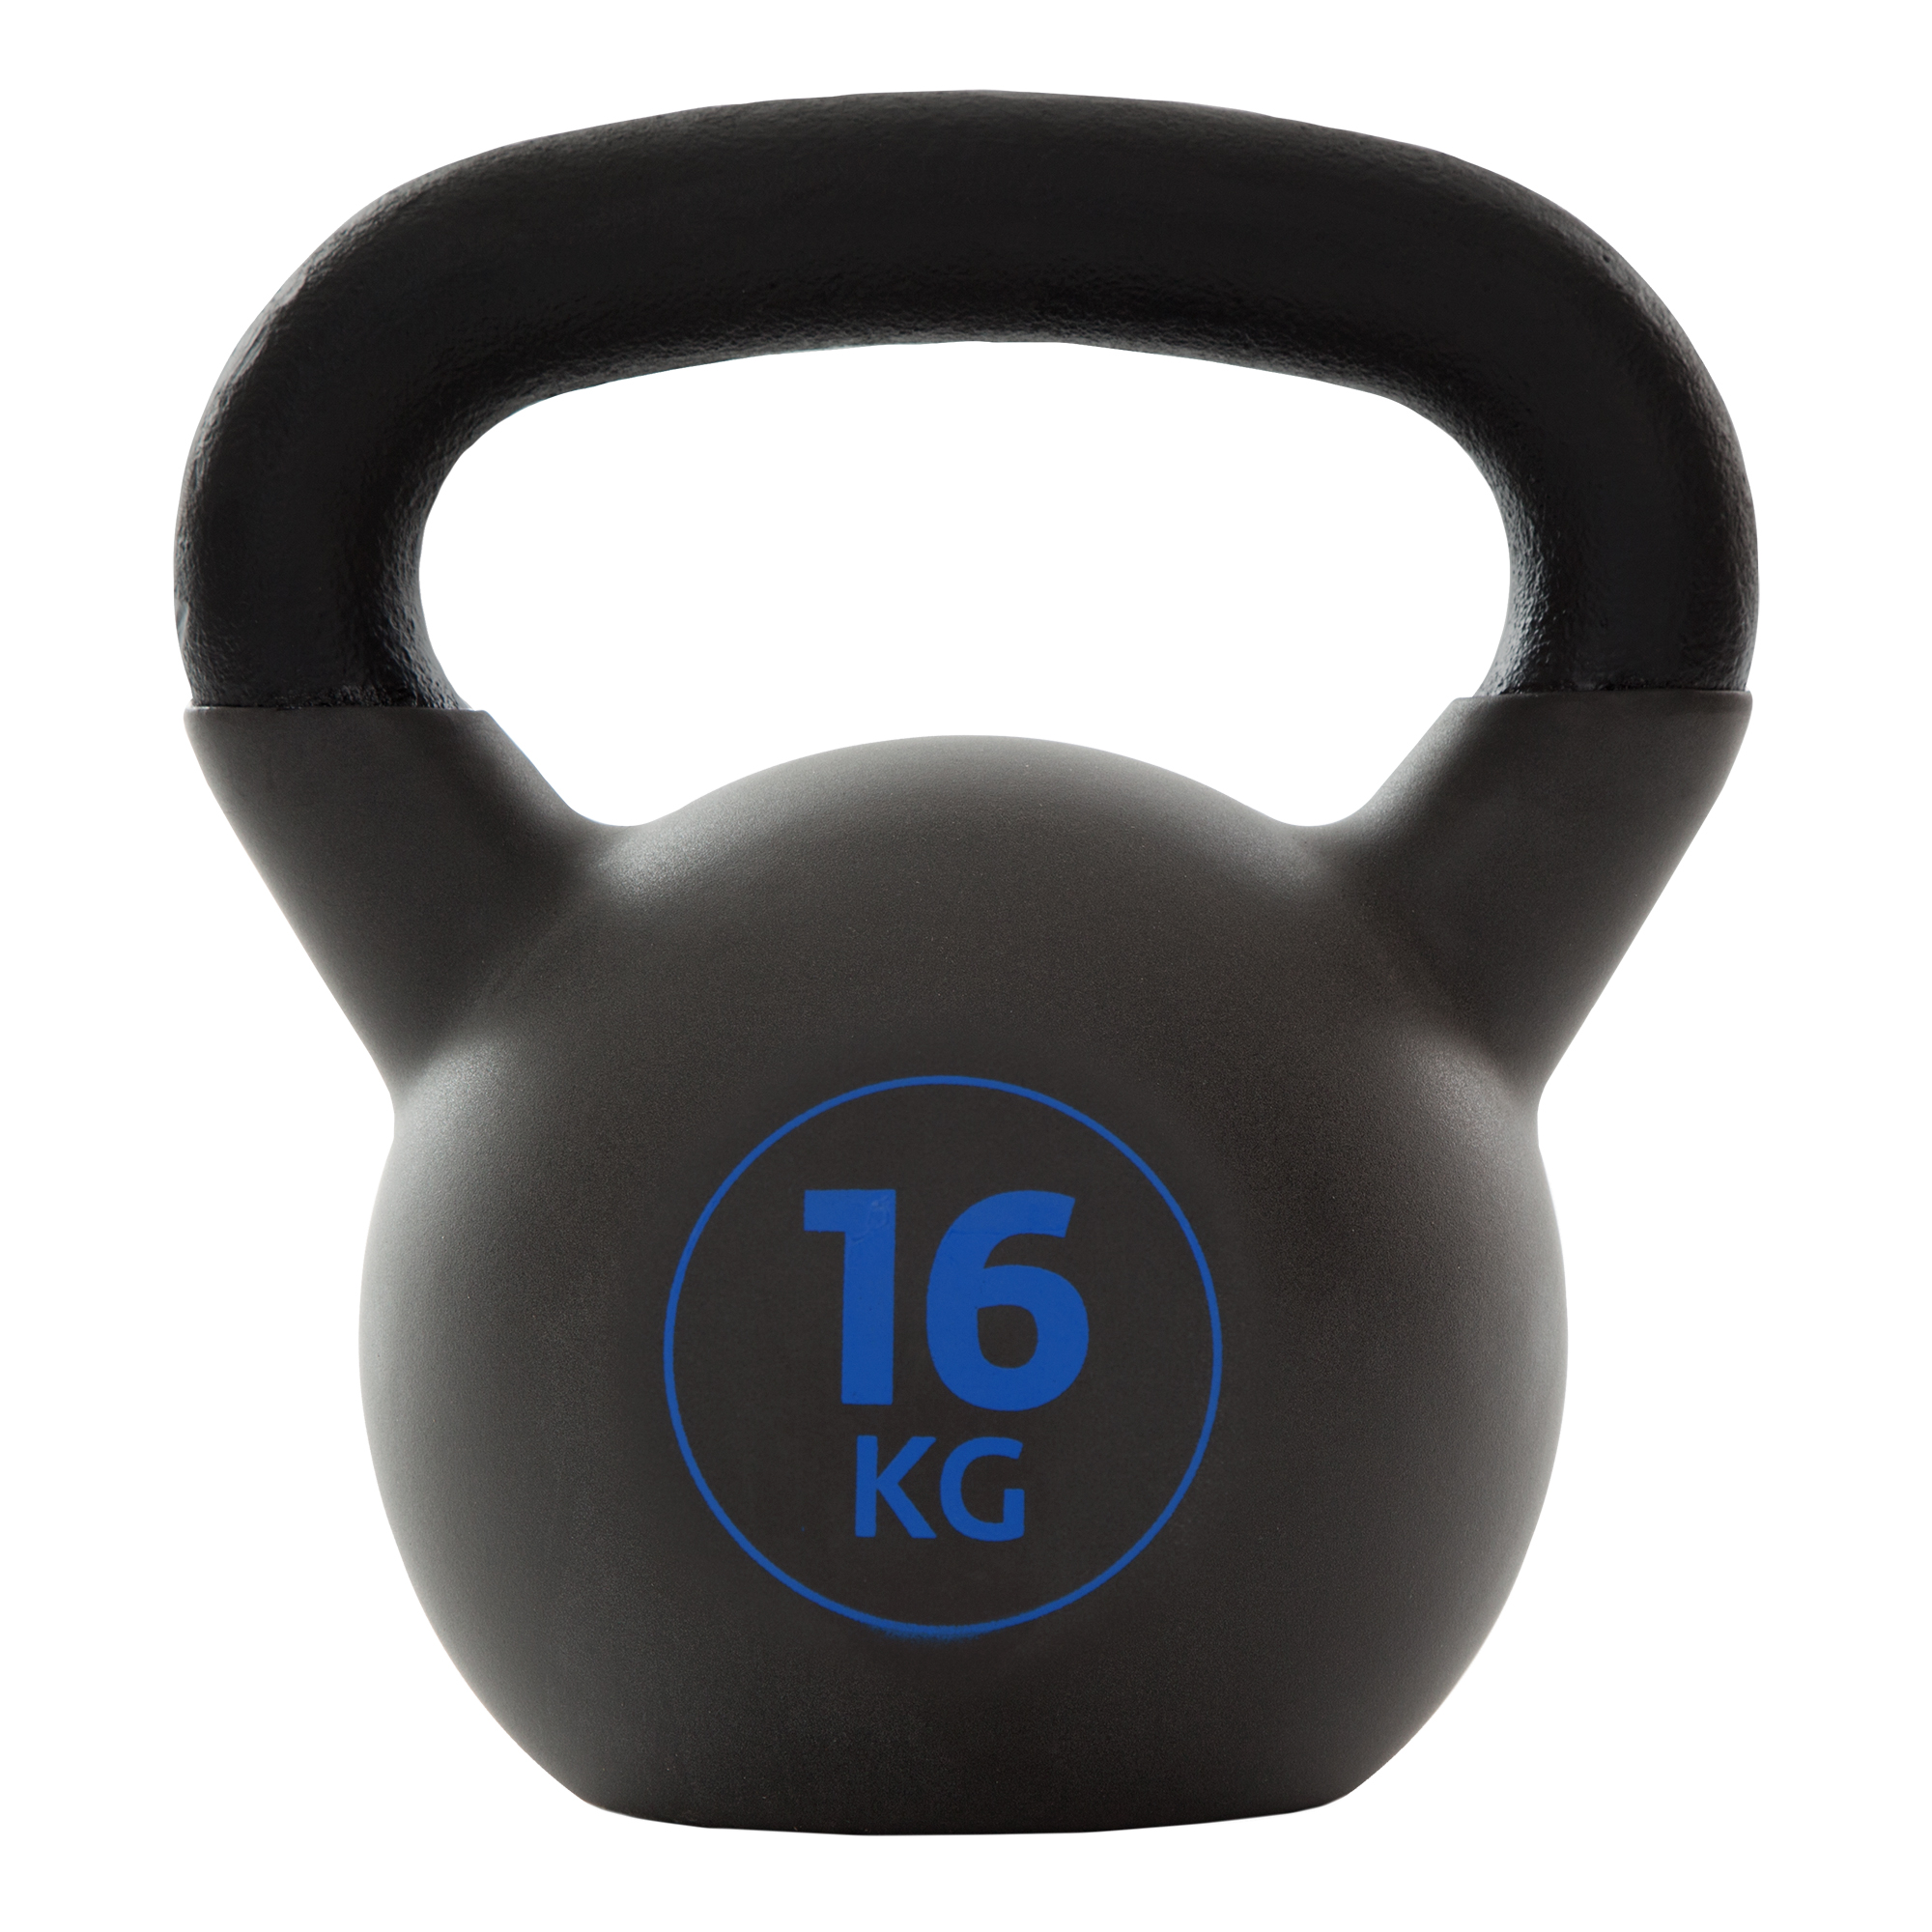 Torneo Гиря Torneo, 16 кг